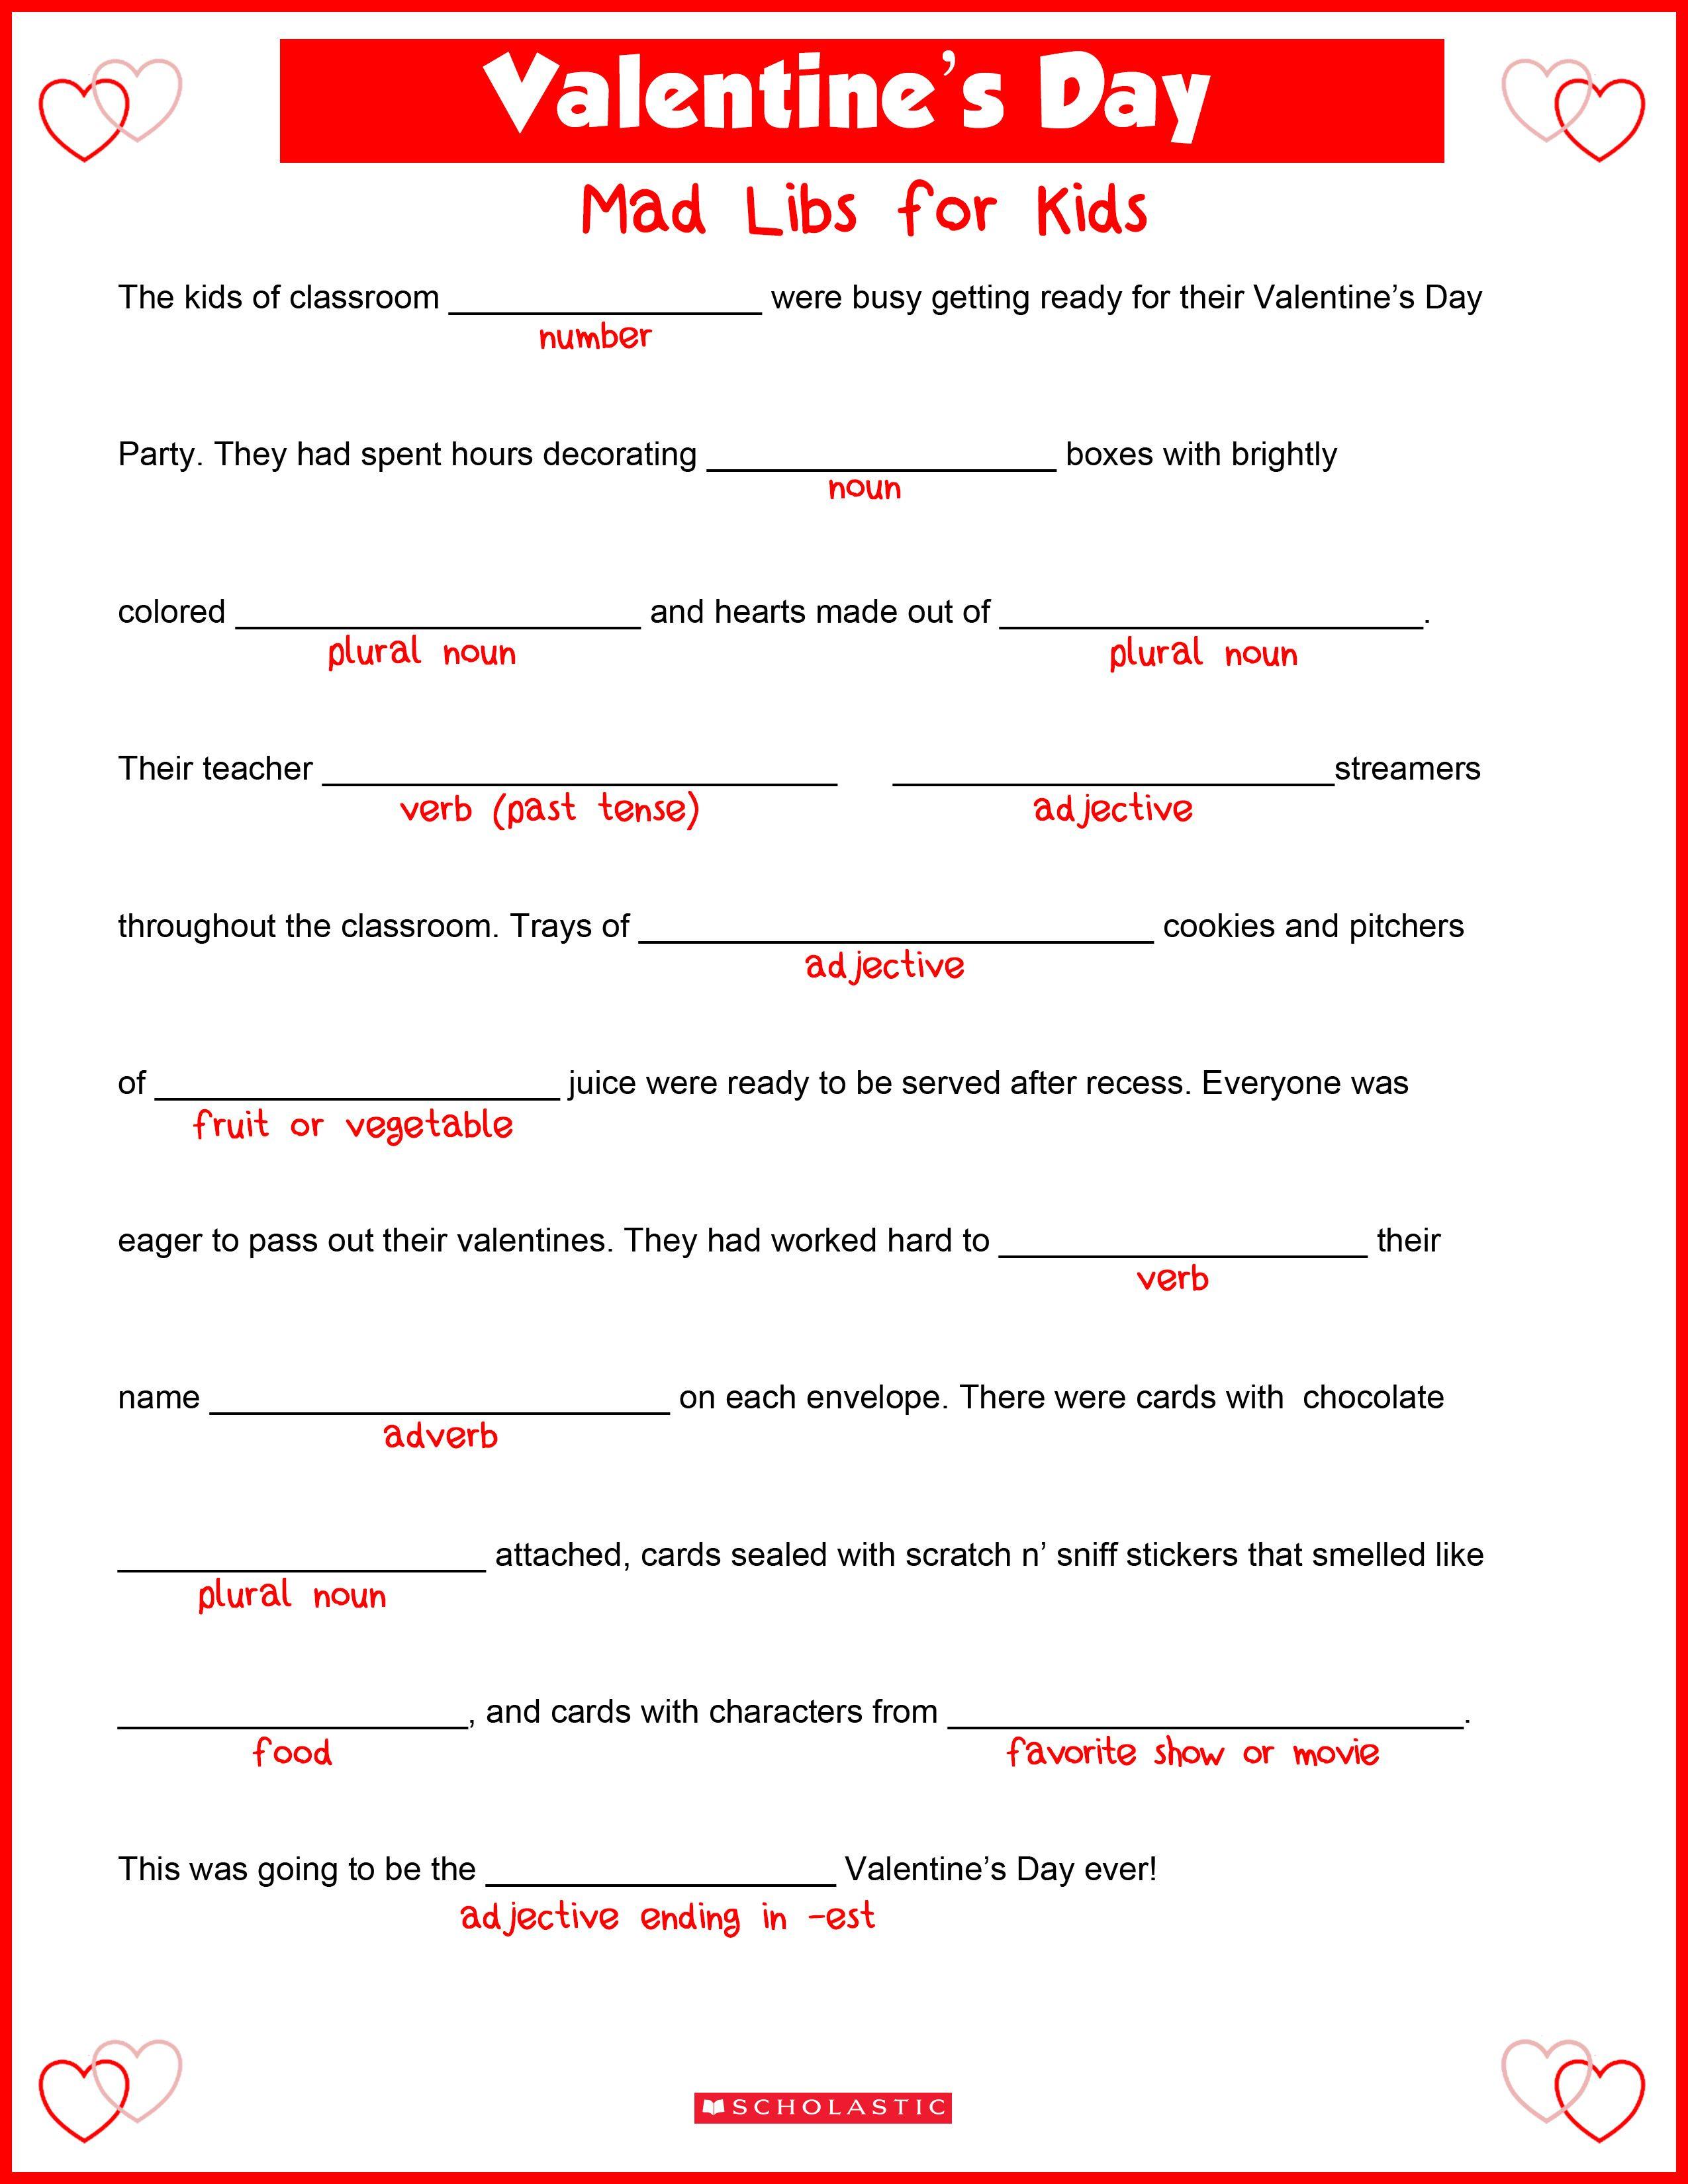 medium resolution of Valentine's Day Mad Libs   Valentines day words